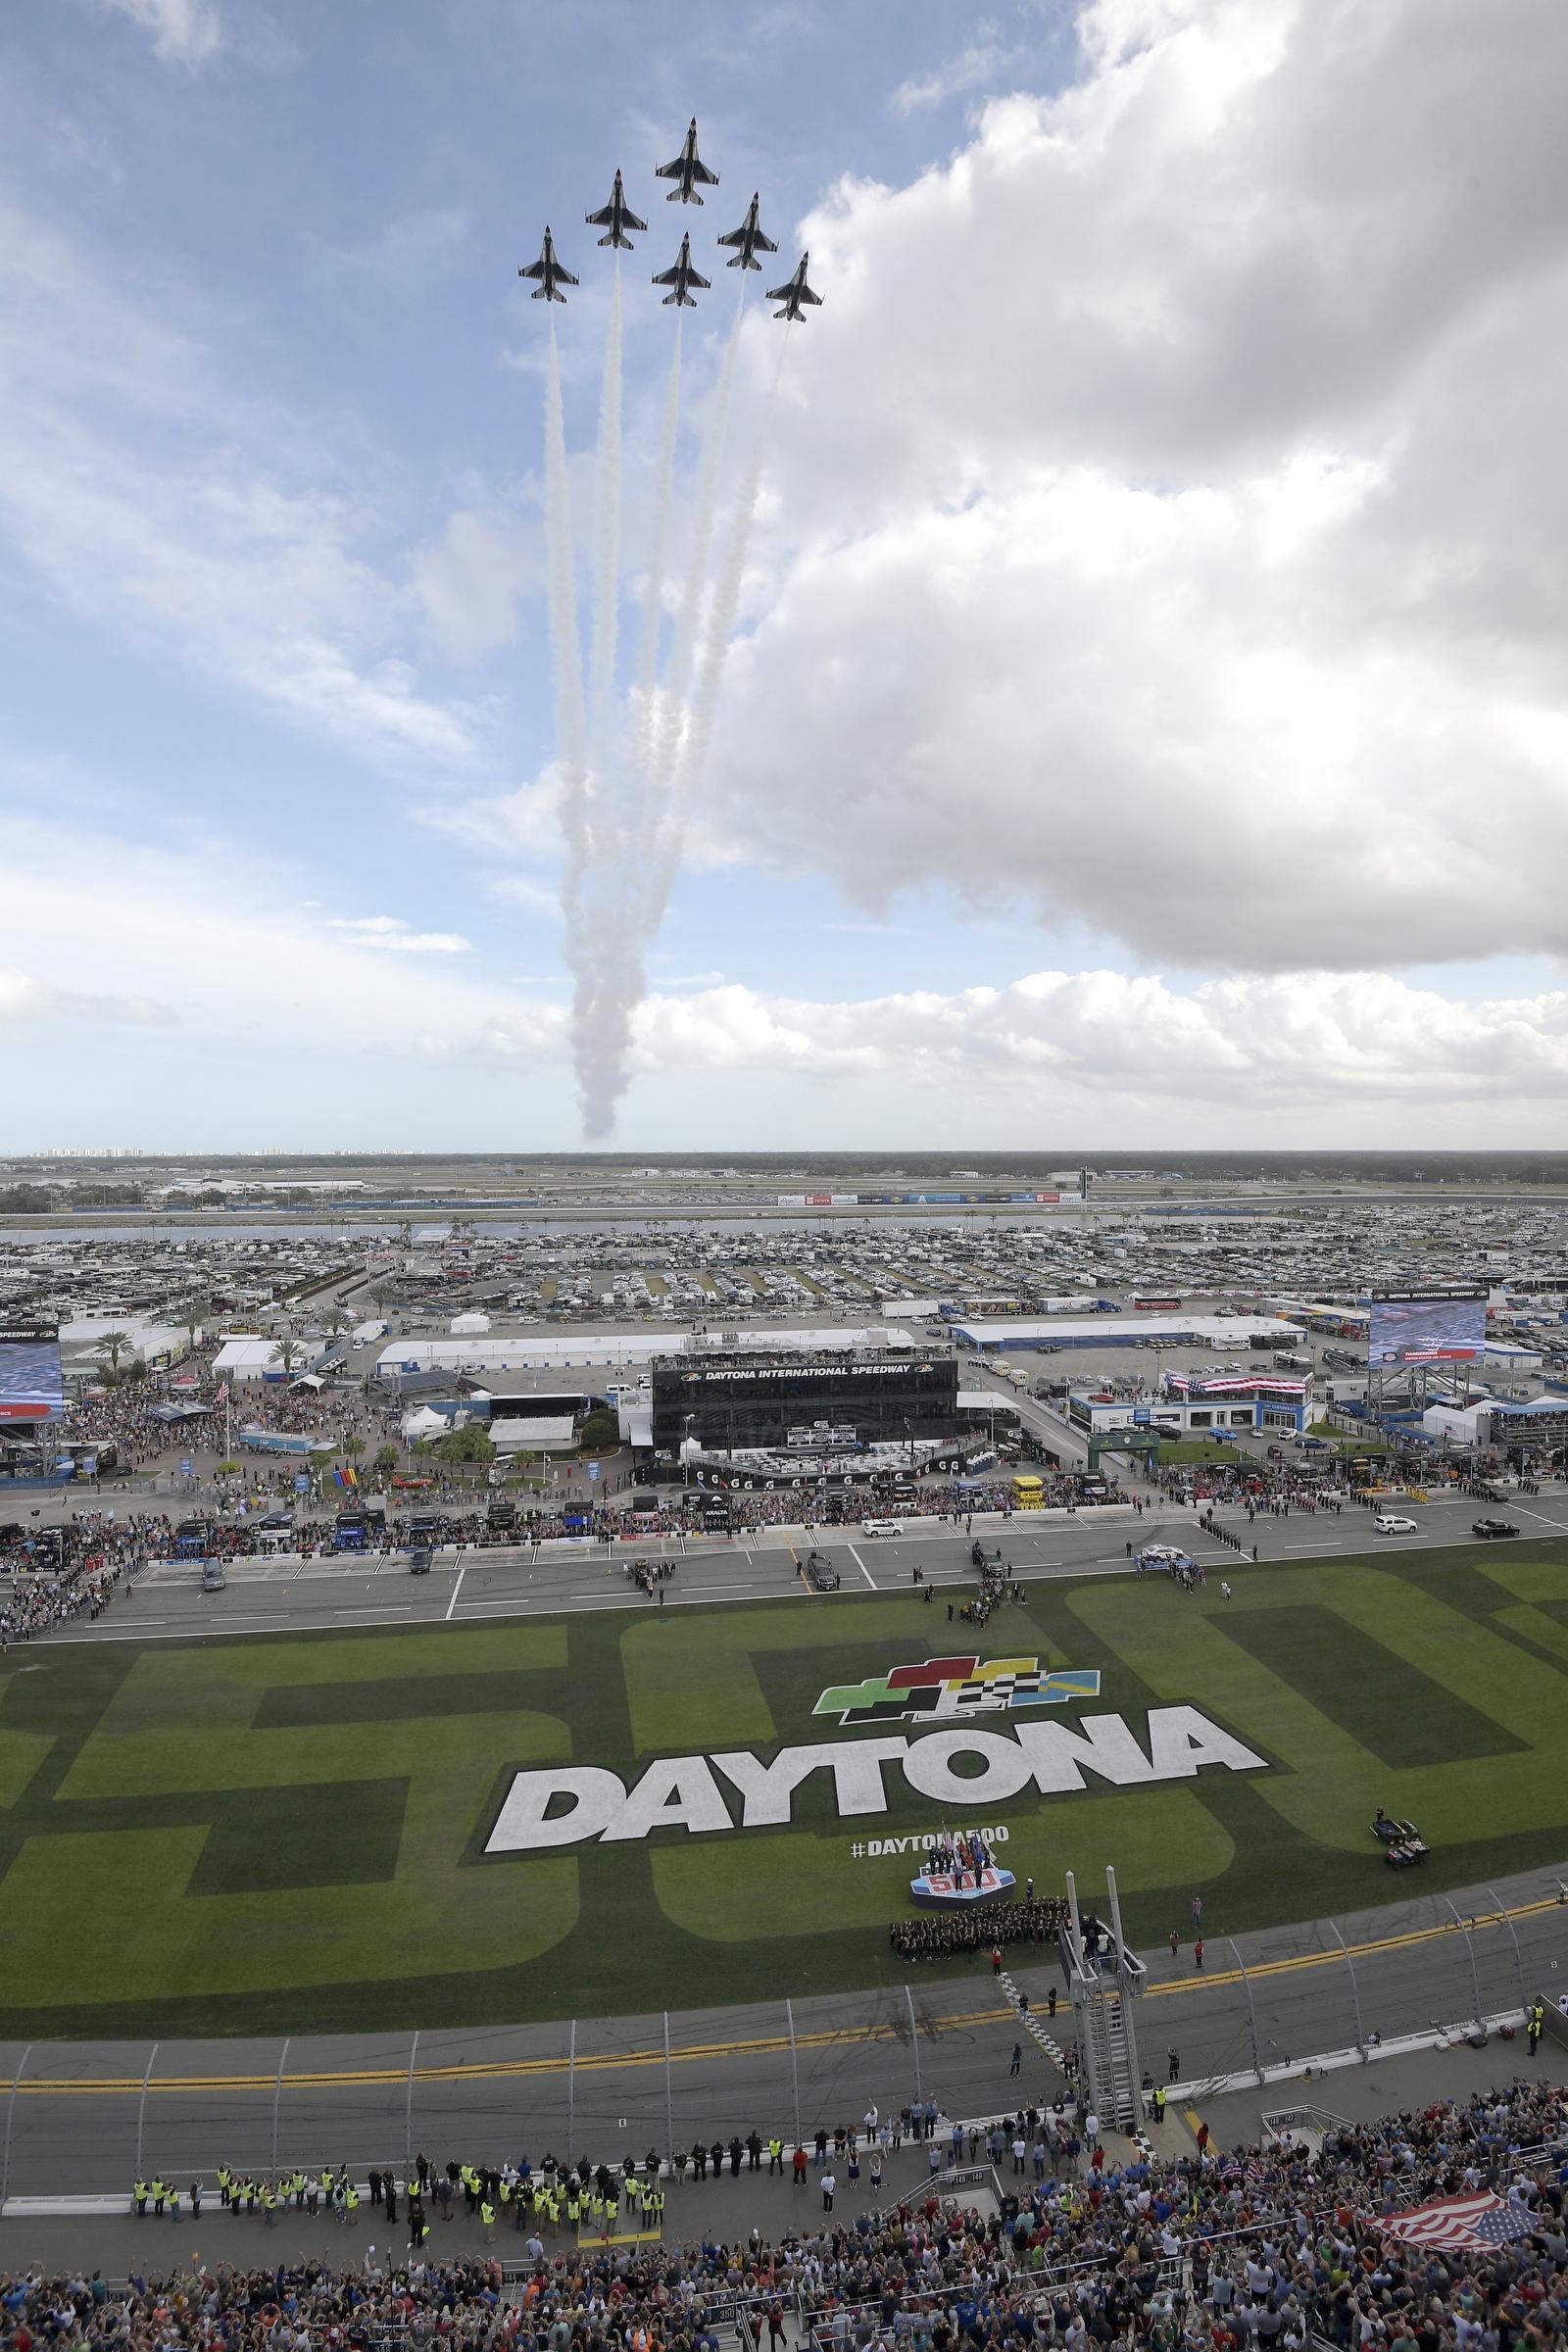 The United States Air Force Thunderbirds perform a flyover during the singing of the national anthem before the NASCAR Daytona 500 auto race at Daytona International Speedway, Sunday, Feb. 16, 2020, in Daytona Beach, Fla. AP